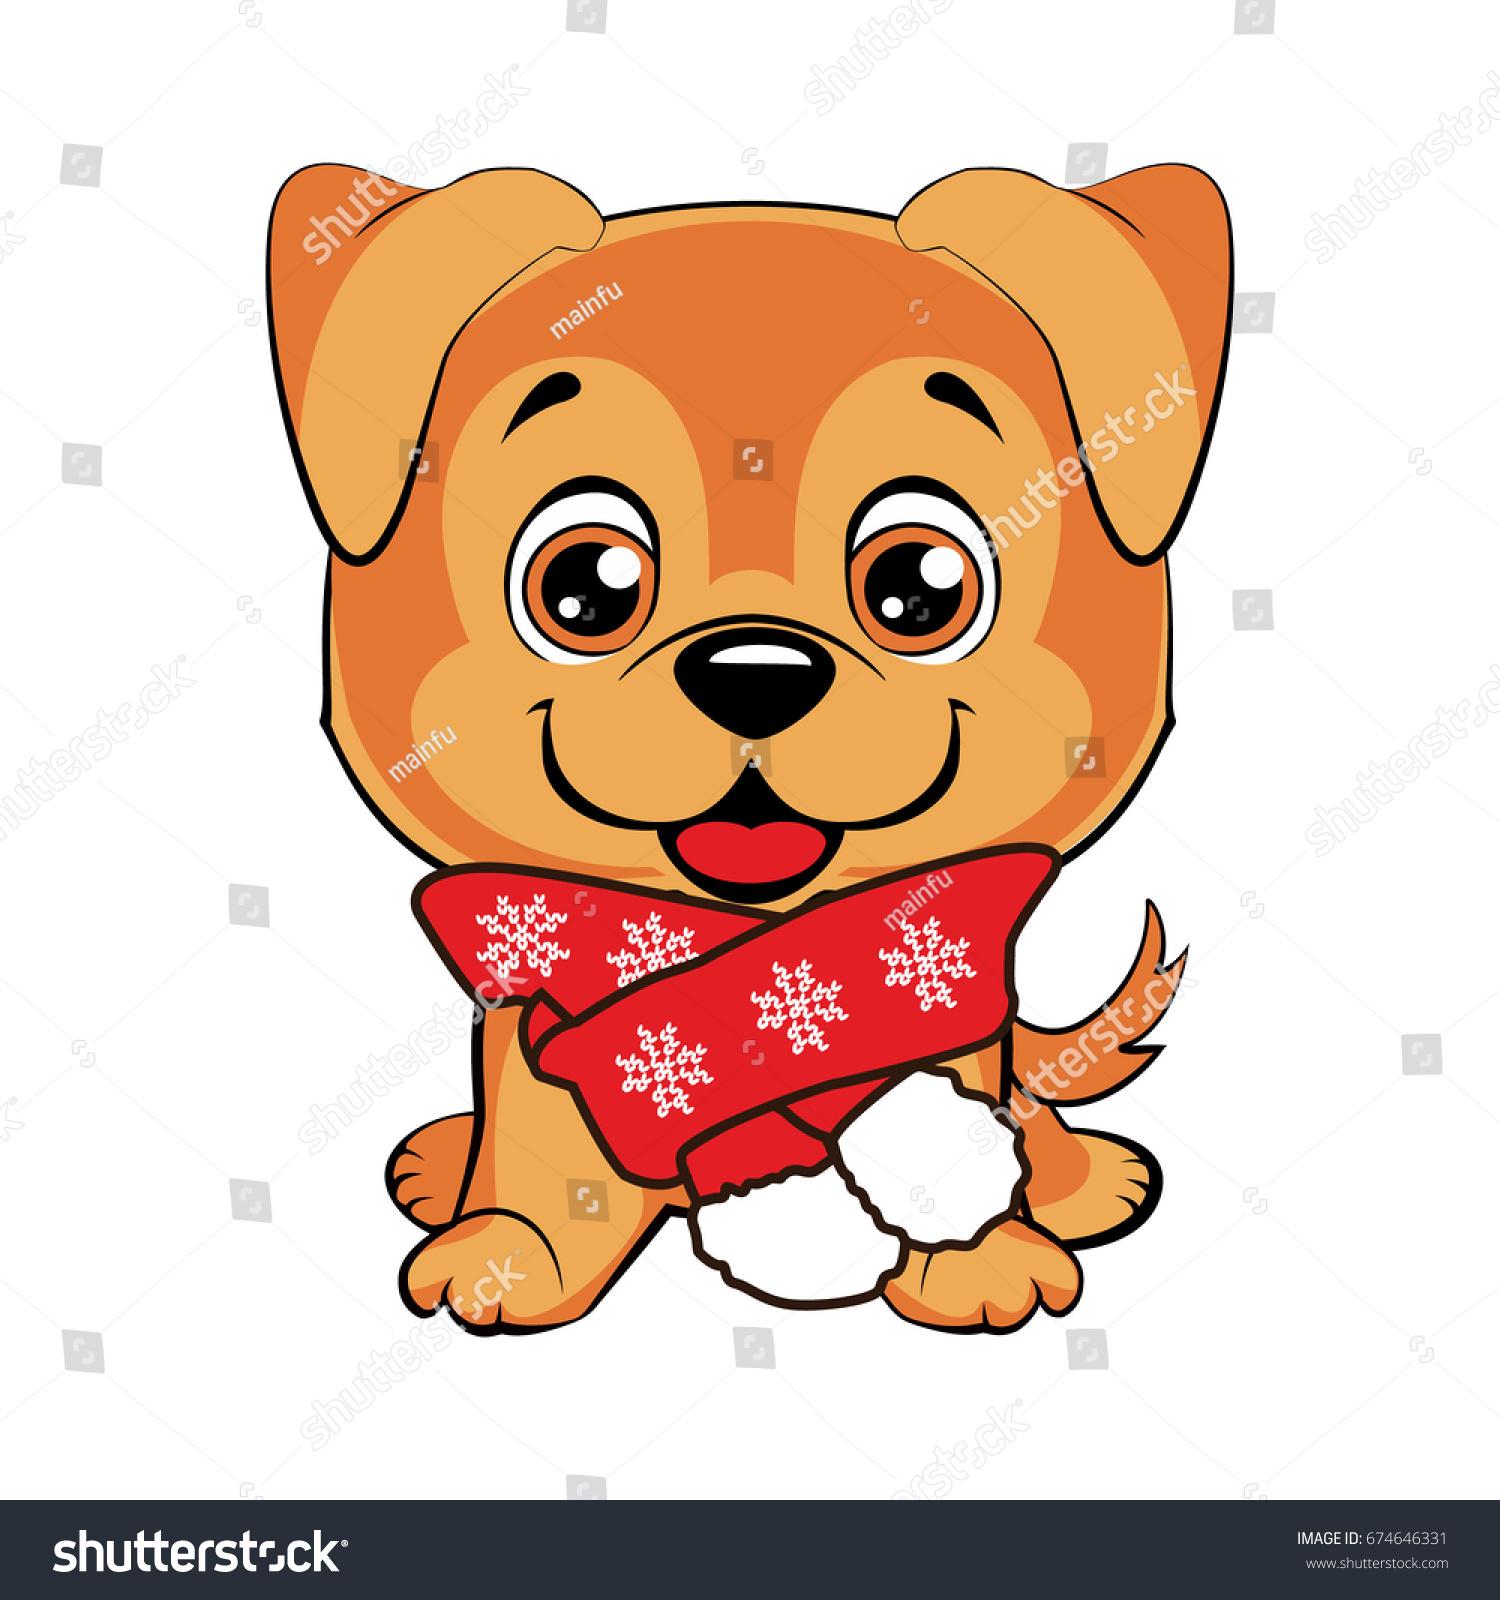 Doggy Scarf Happy Dog Cartoon Cute Stock Vector Royalty Free 674646331